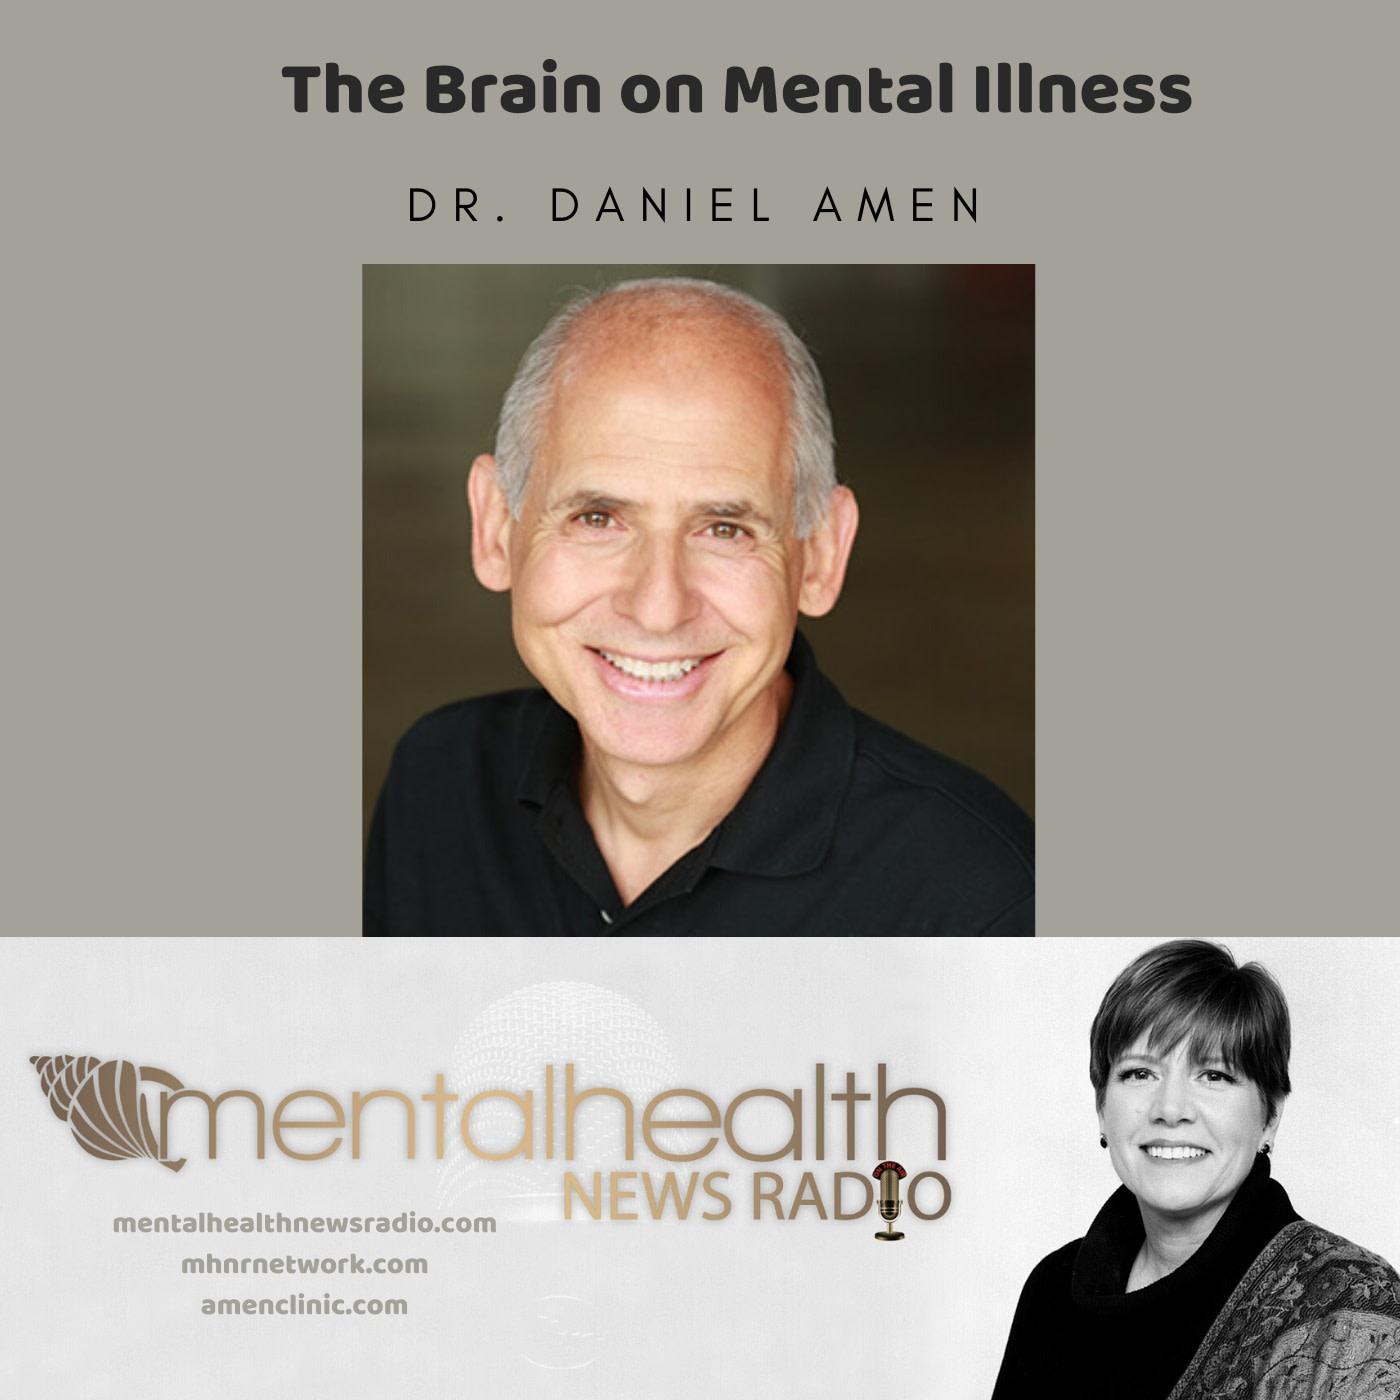 Mental Health News Radio